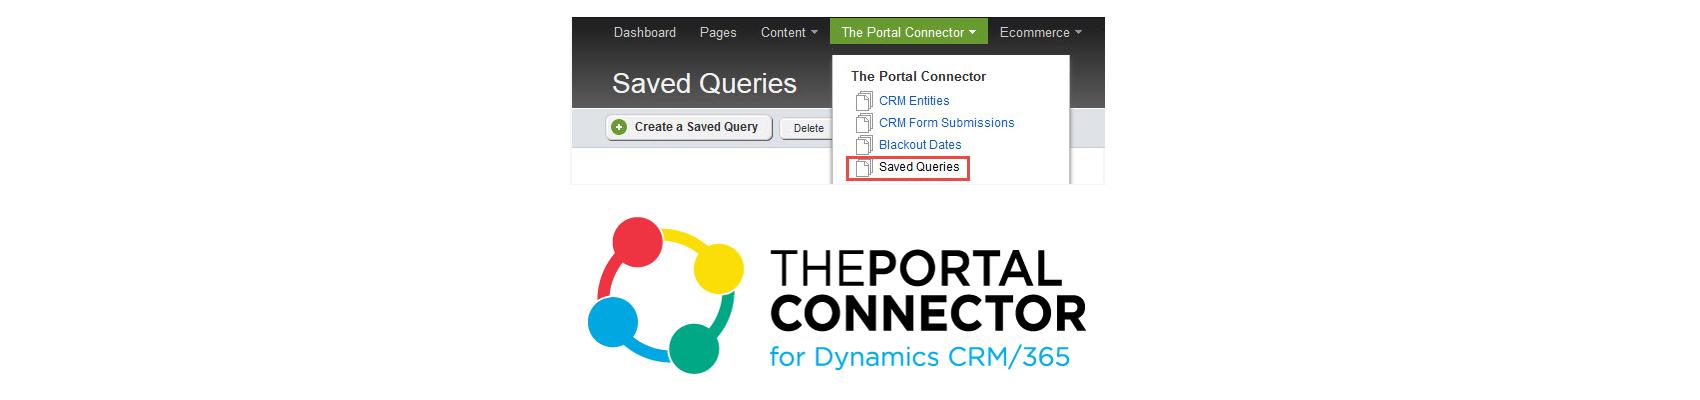 Portal Connector Saved Queries